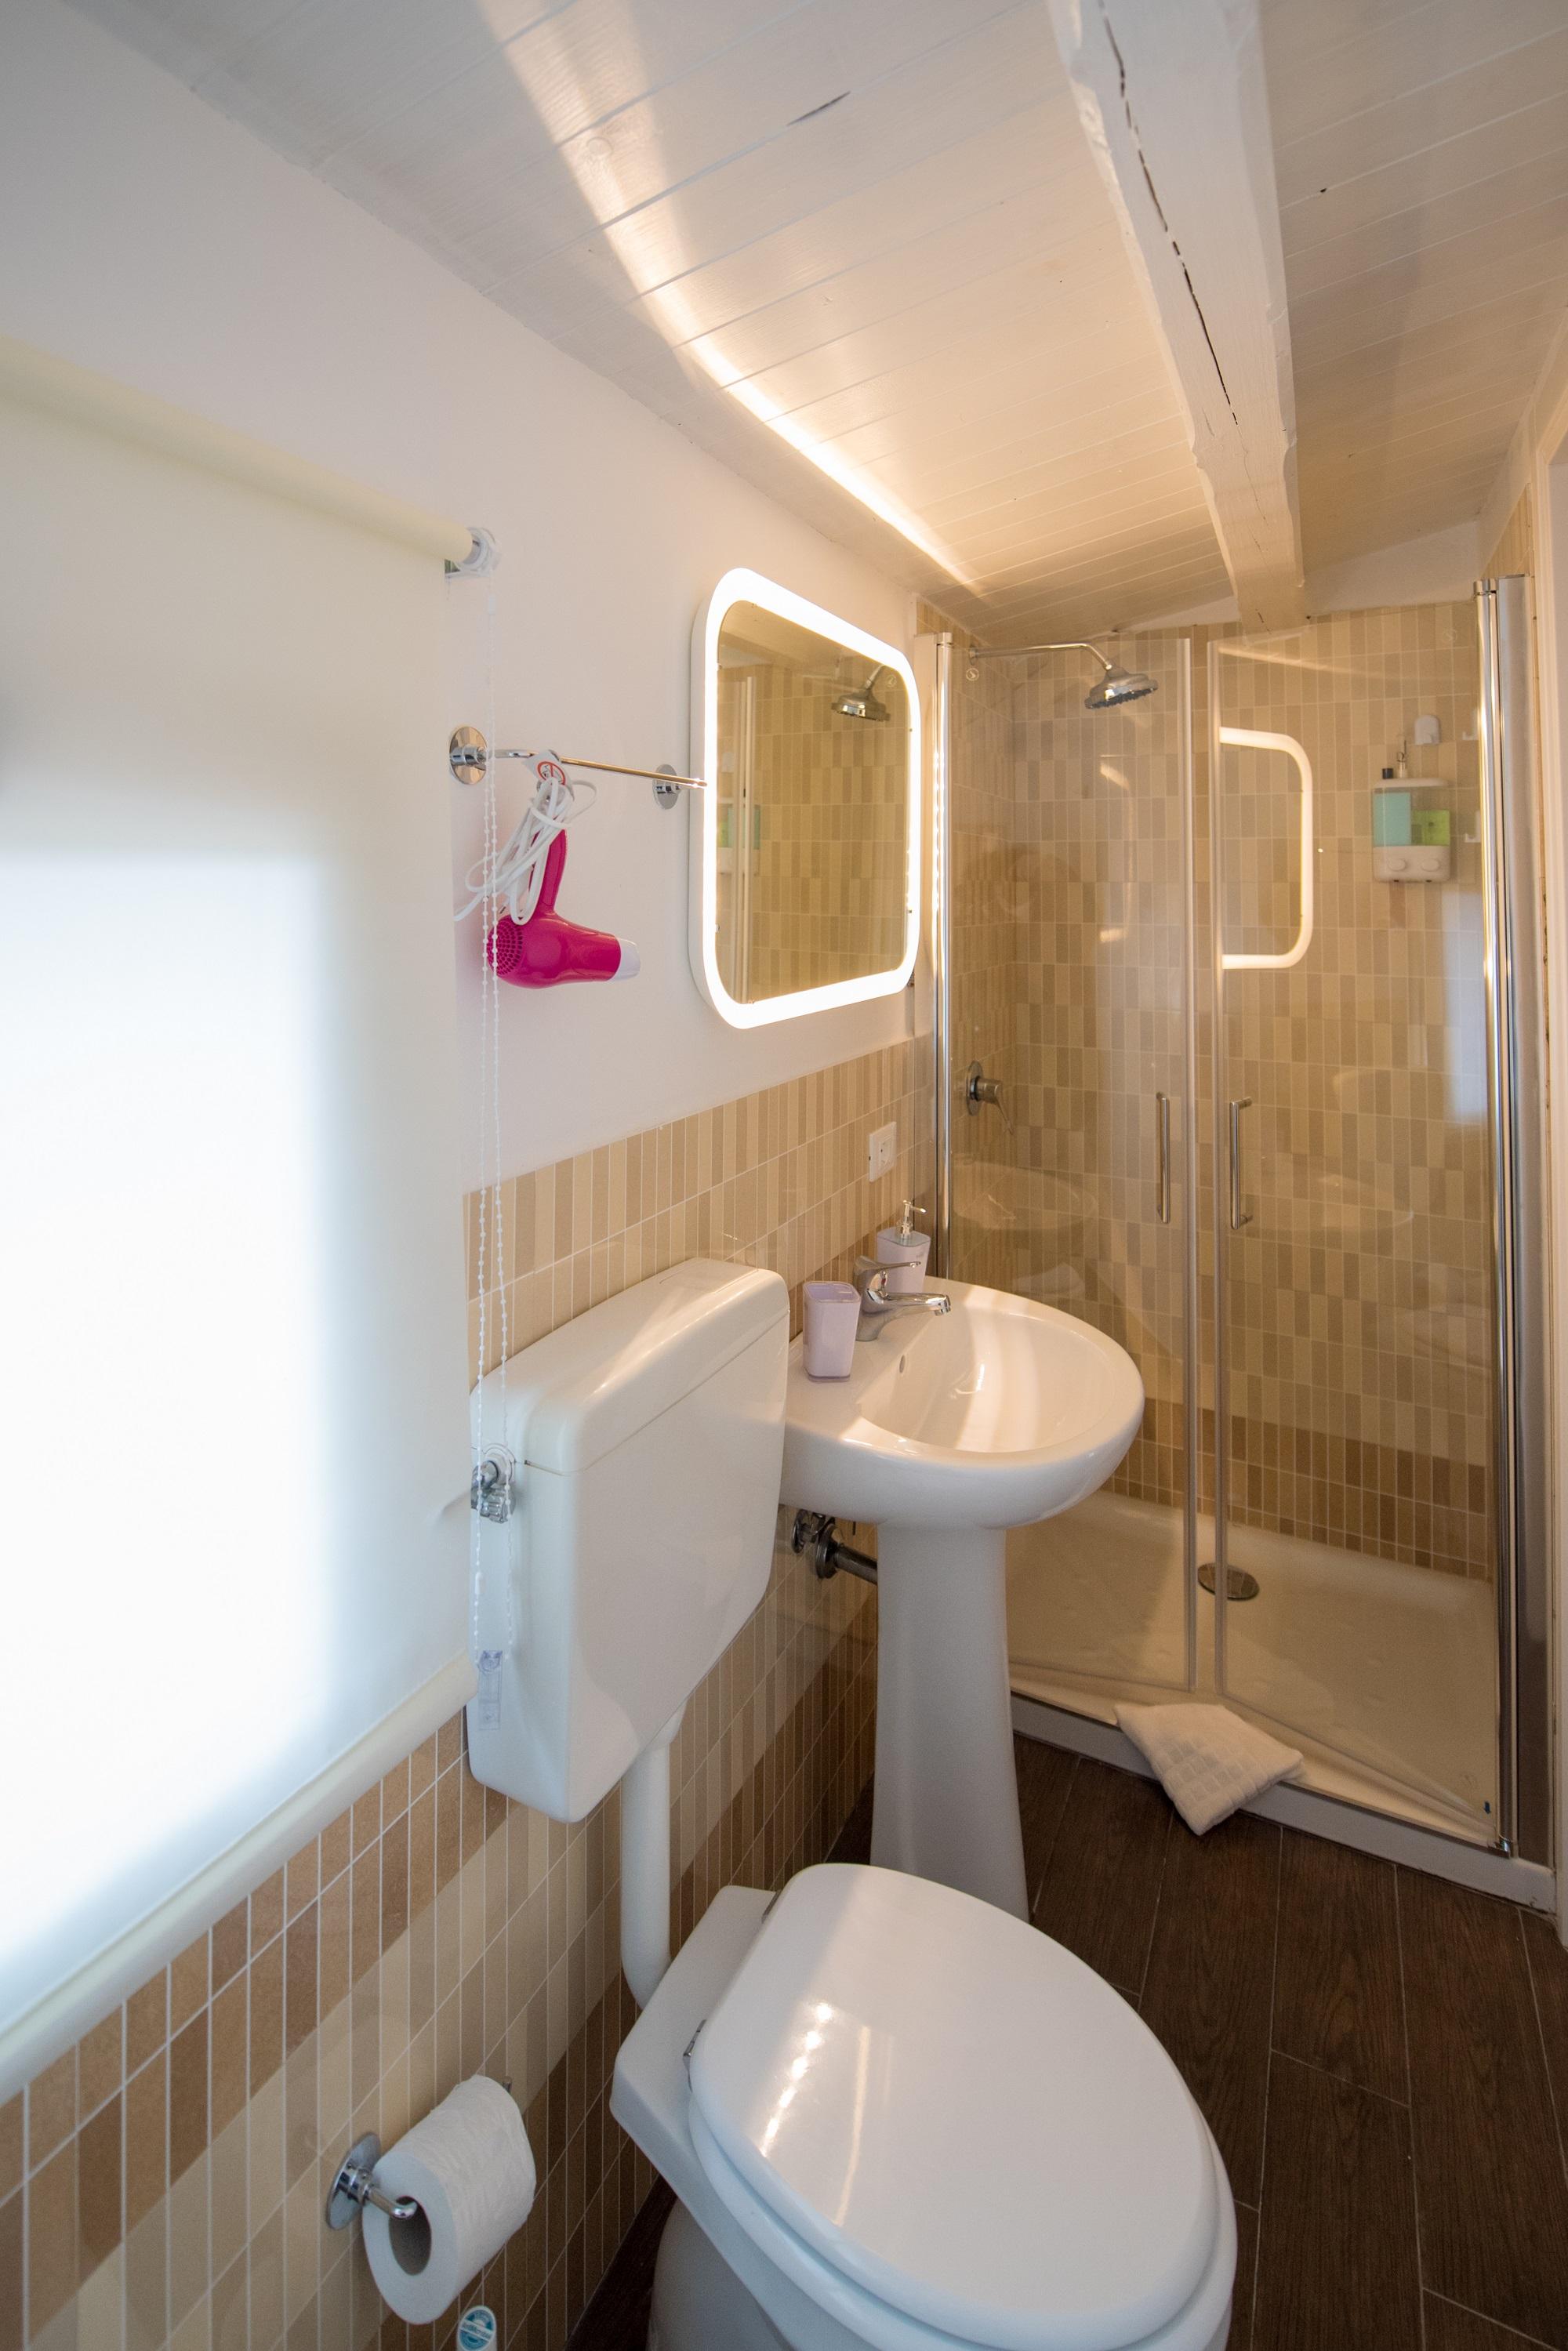 Holiday apartment Camagna Country House - in der sizilianischen Landschaft eingetaucht (2420806), Partanna, Trapani, Sicily, Italy, picture 3